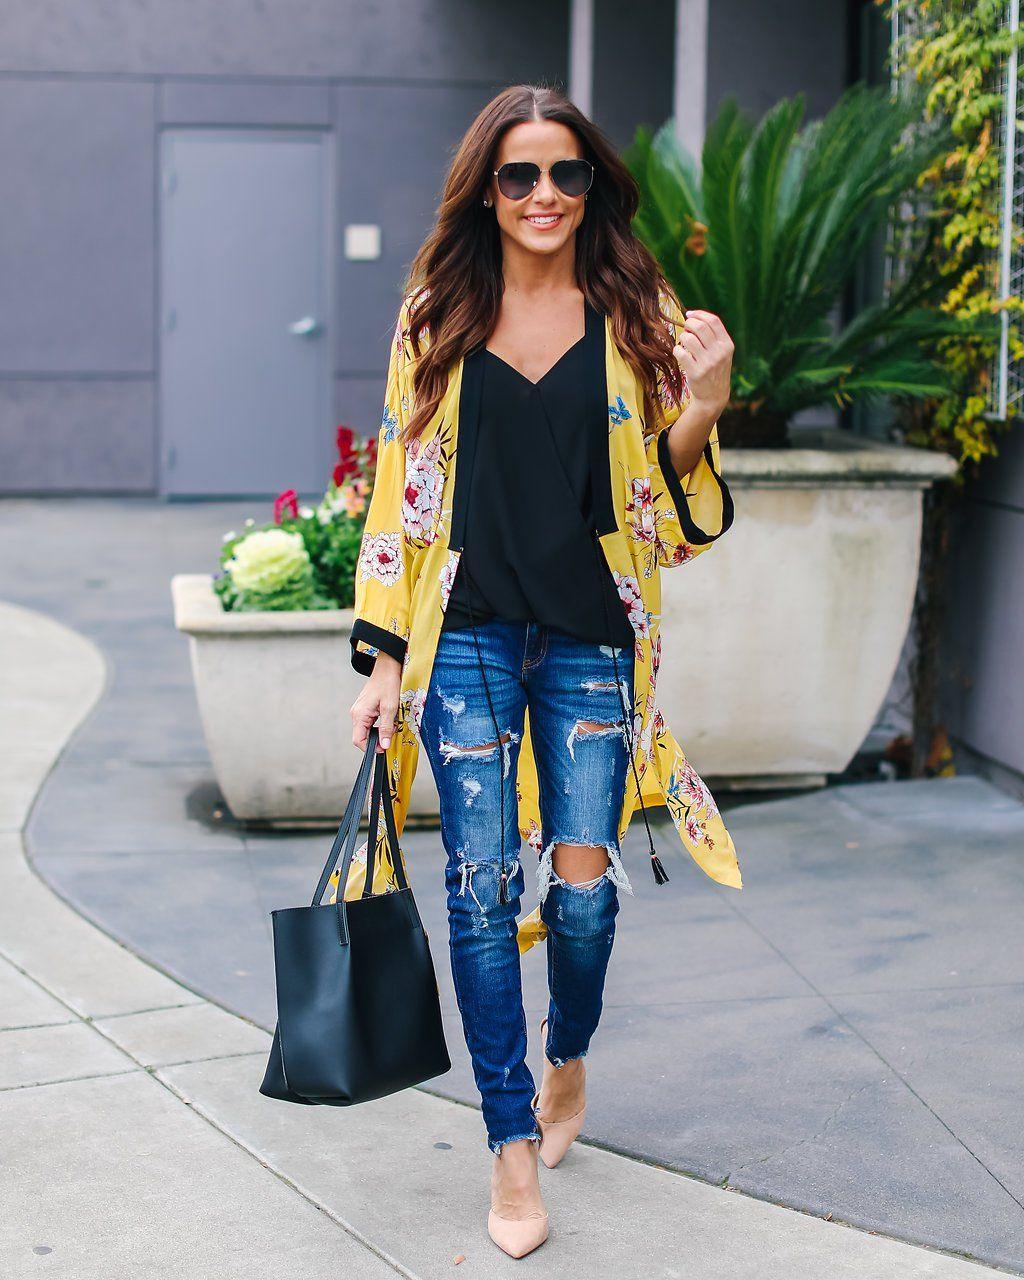 c94d999f0f Outfit ideas. Yellow floral kimono. Black top. Distressed jeans. Nude  pumps. Black pumps.